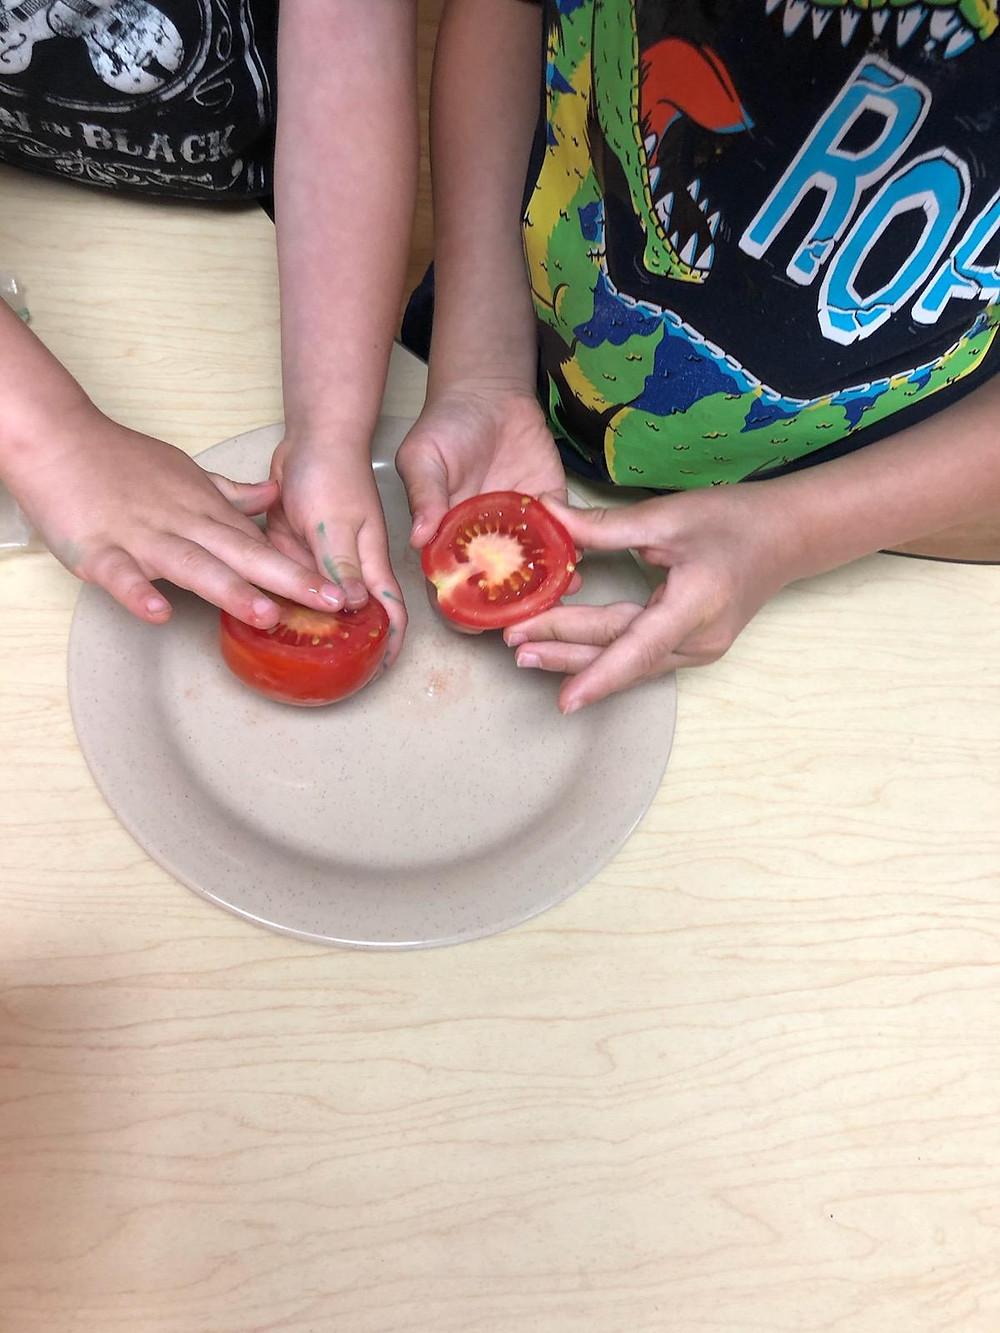 preschoolers examining tomatoes